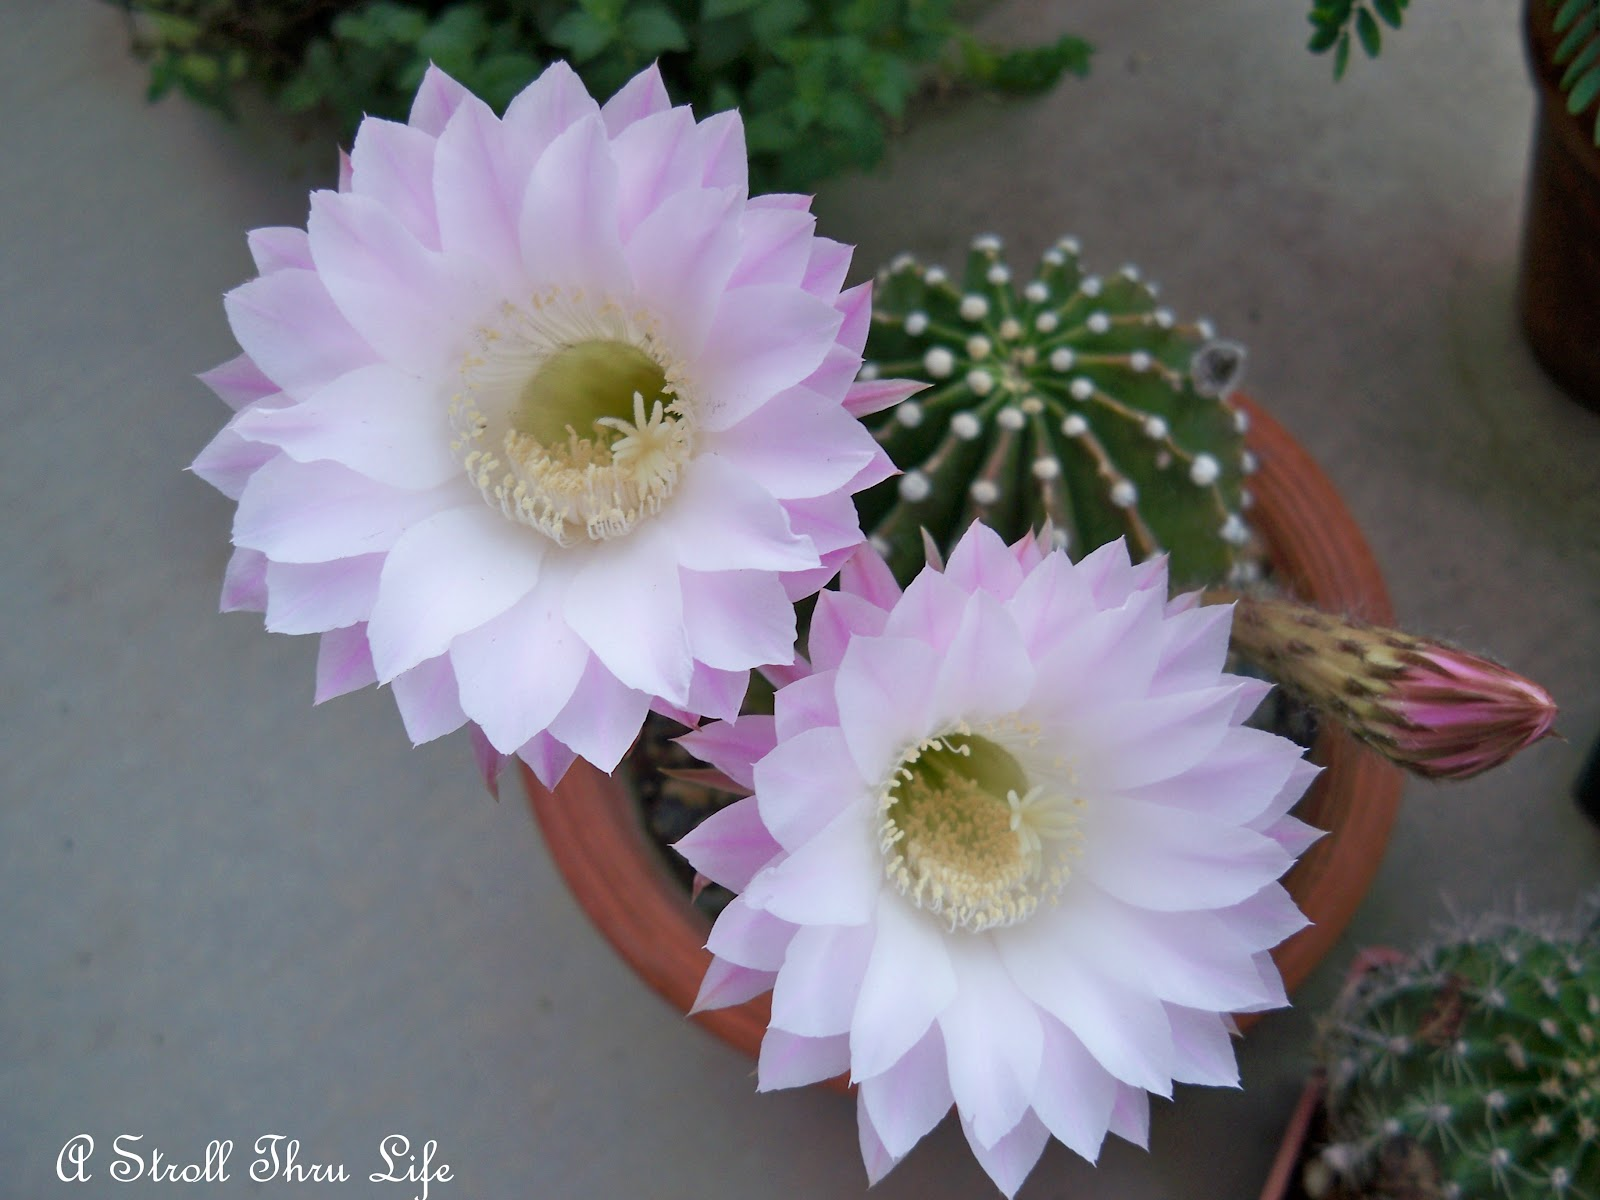 A Stroll Thru Life Cactus Flowers